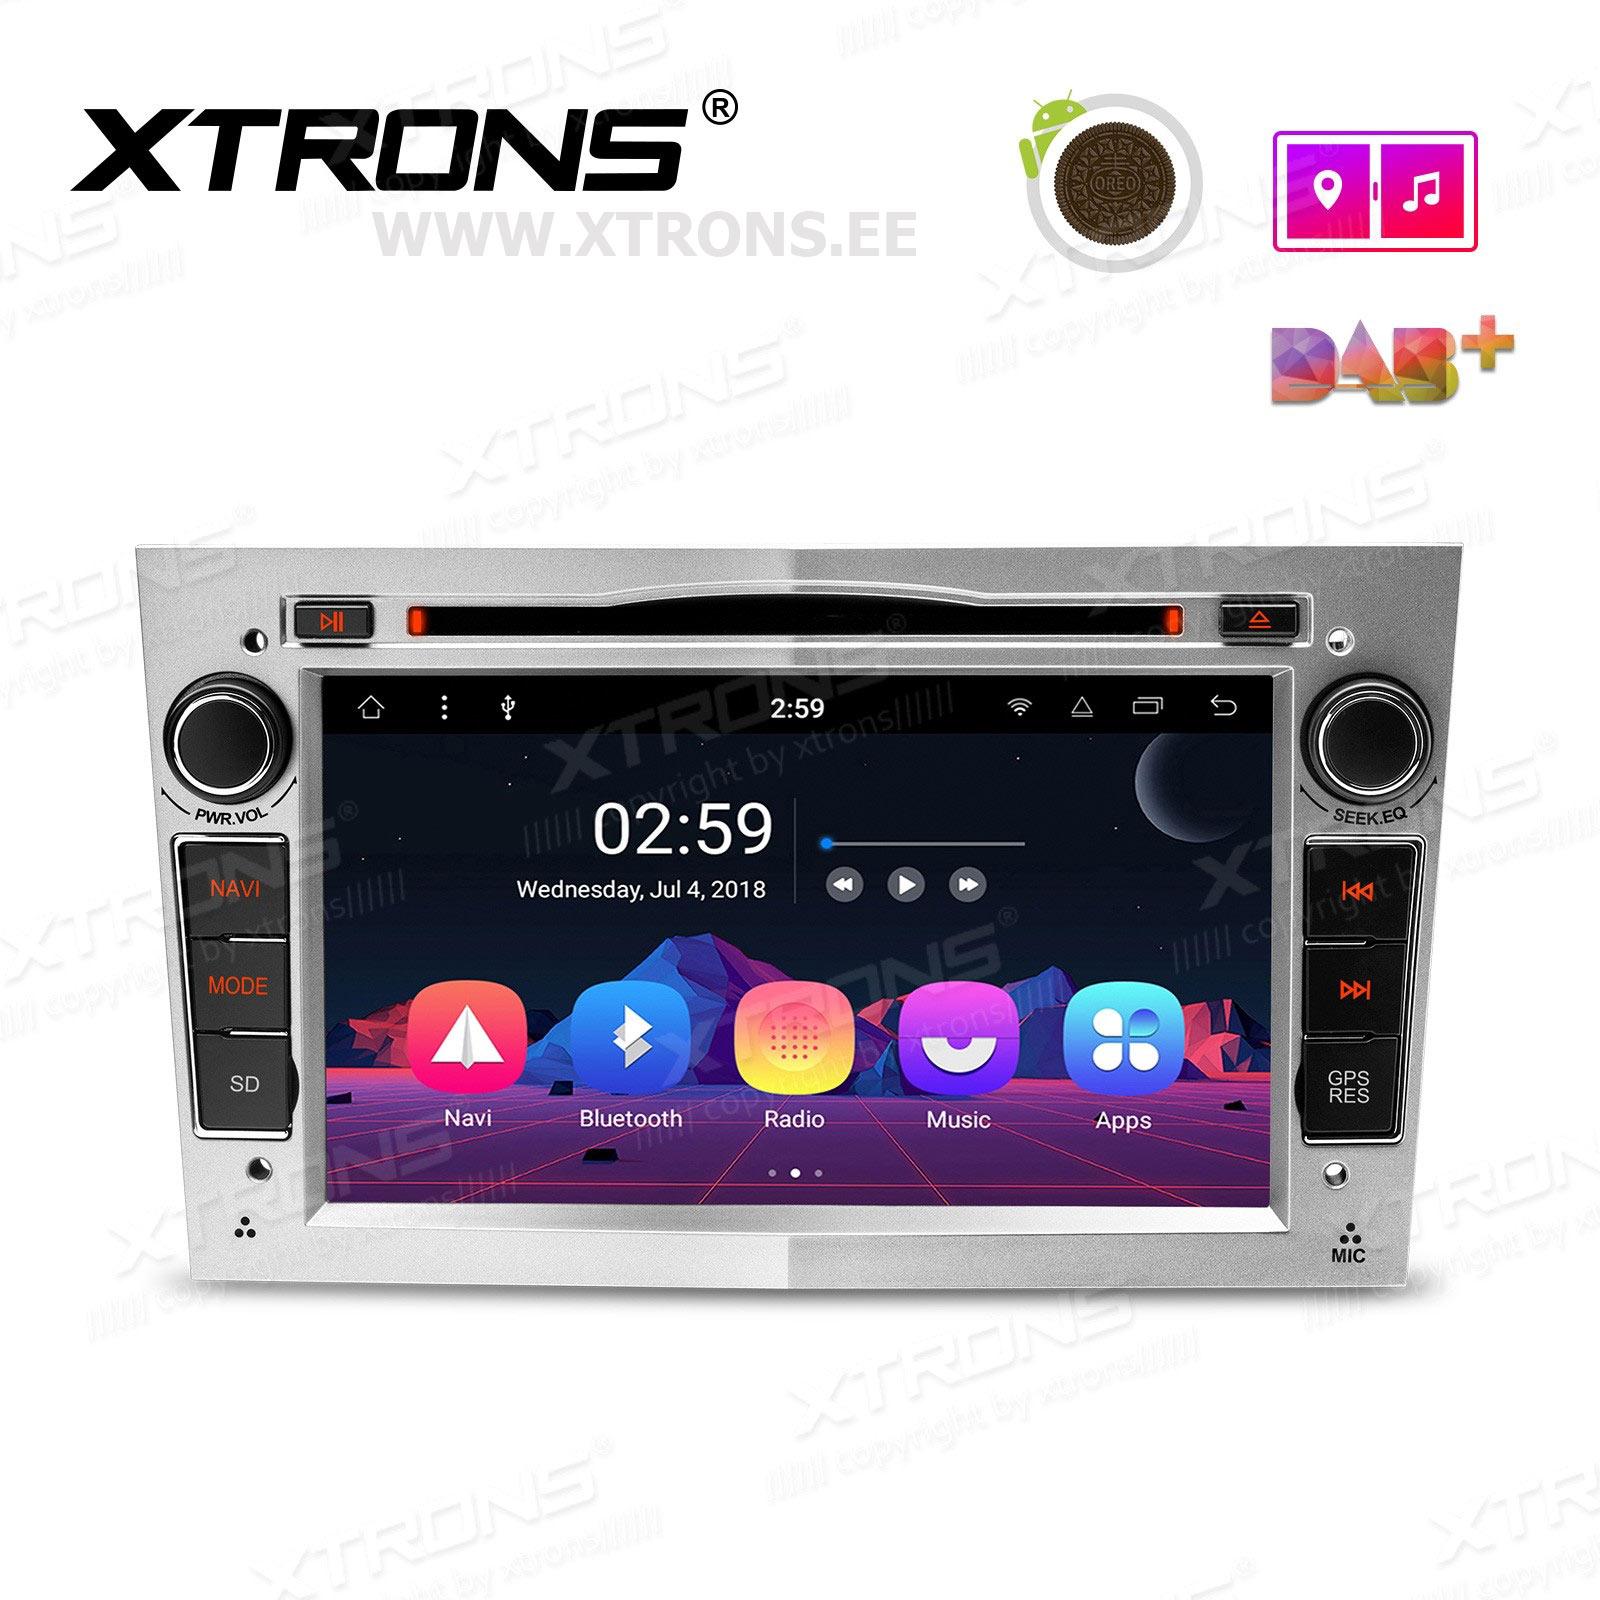 XTRONS PR78OLO-S